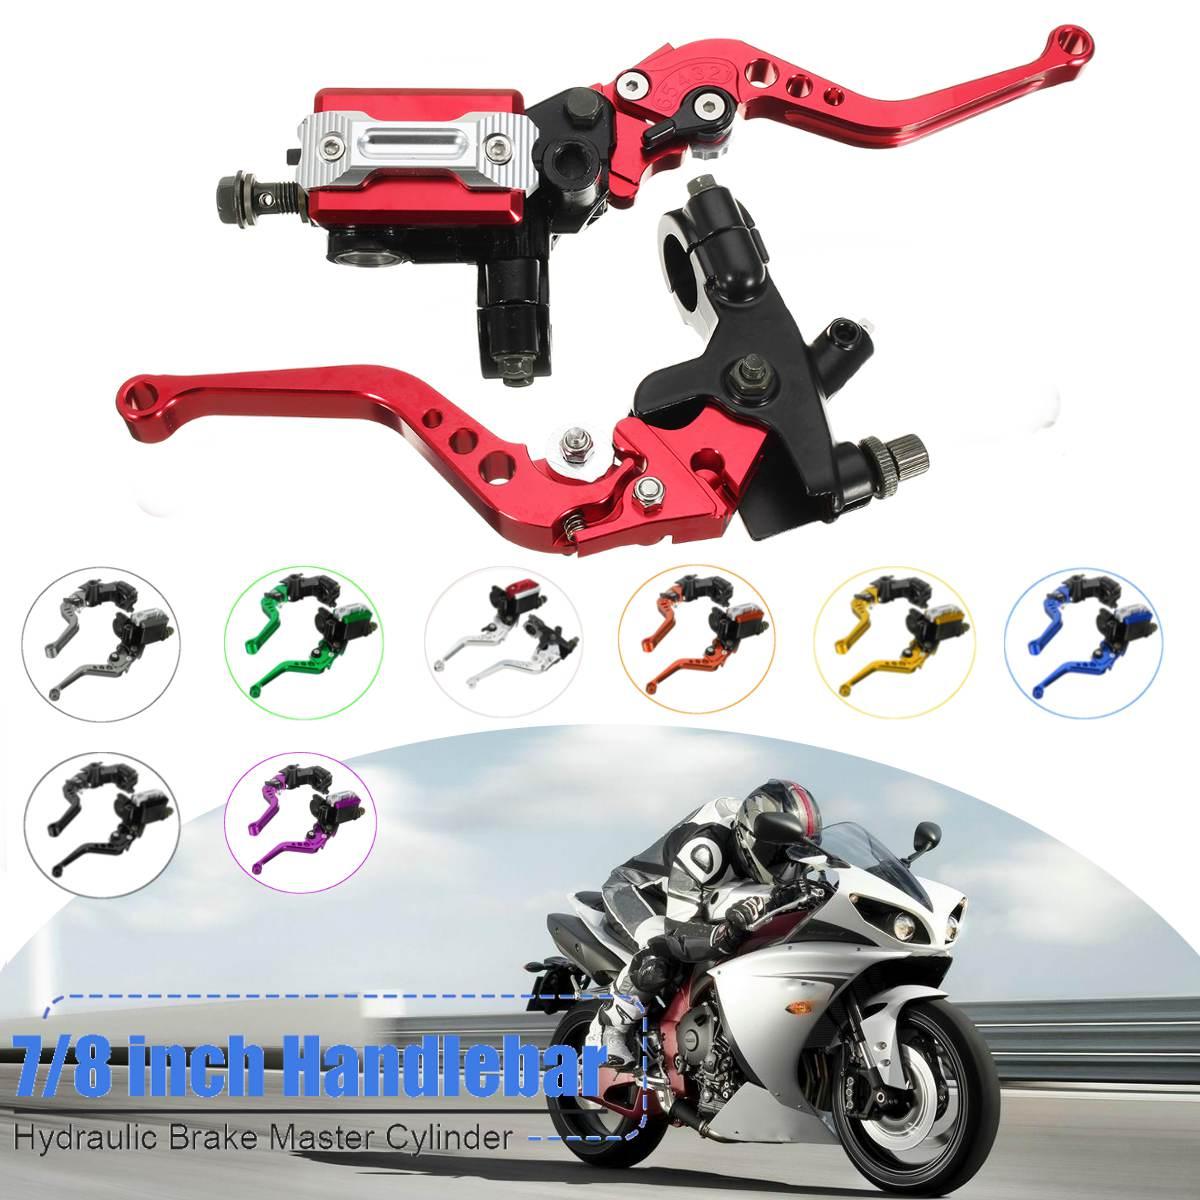 Universal Motorcycle 7/8 CNC Front Brake Clutch Master Cylinder Lever Set Reservoir new motorcycle front brake master cylinder reservoir clutch lever for hon da cb600f cb650 cb700 cb750 cbr600 cbx750 vf750 vfr700